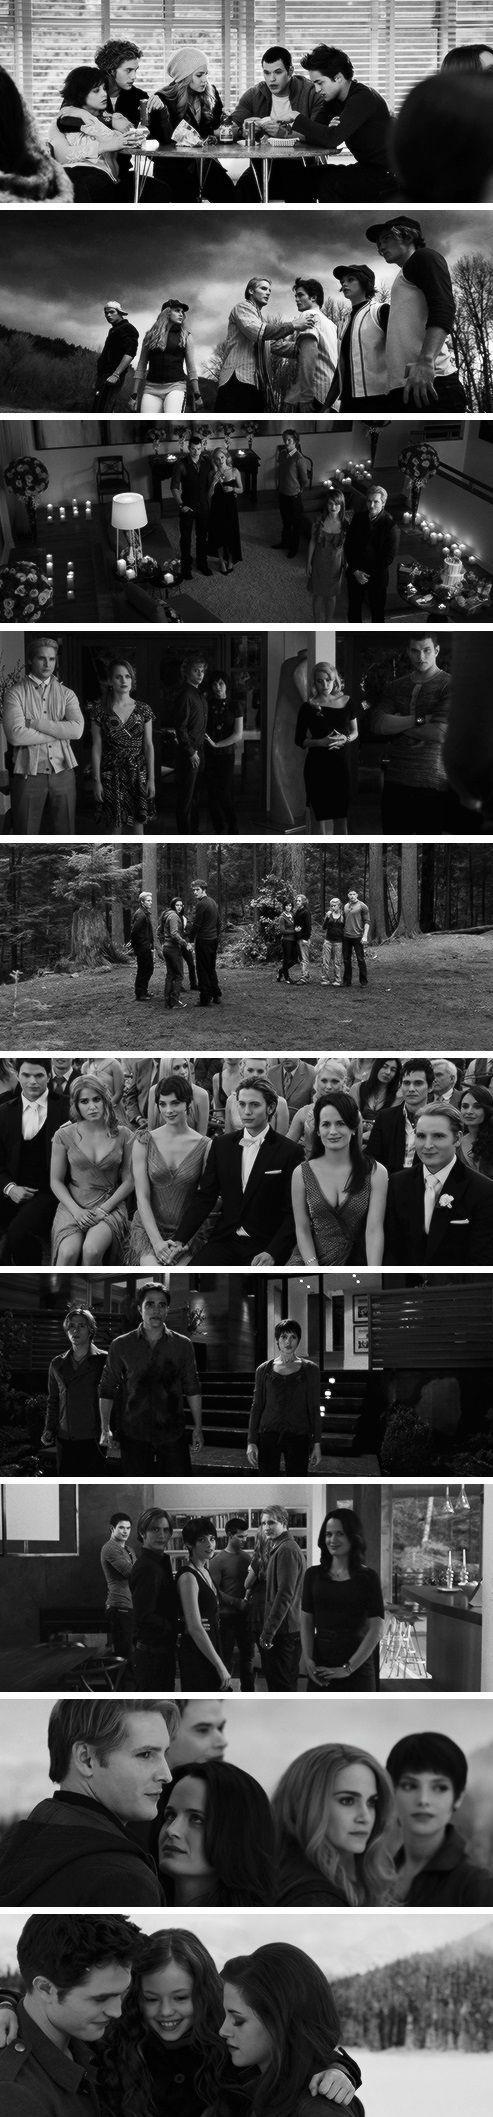 Twilight Saga - Twilight - New Moon - Eclipse - Breaking Dawn - Cullen Family